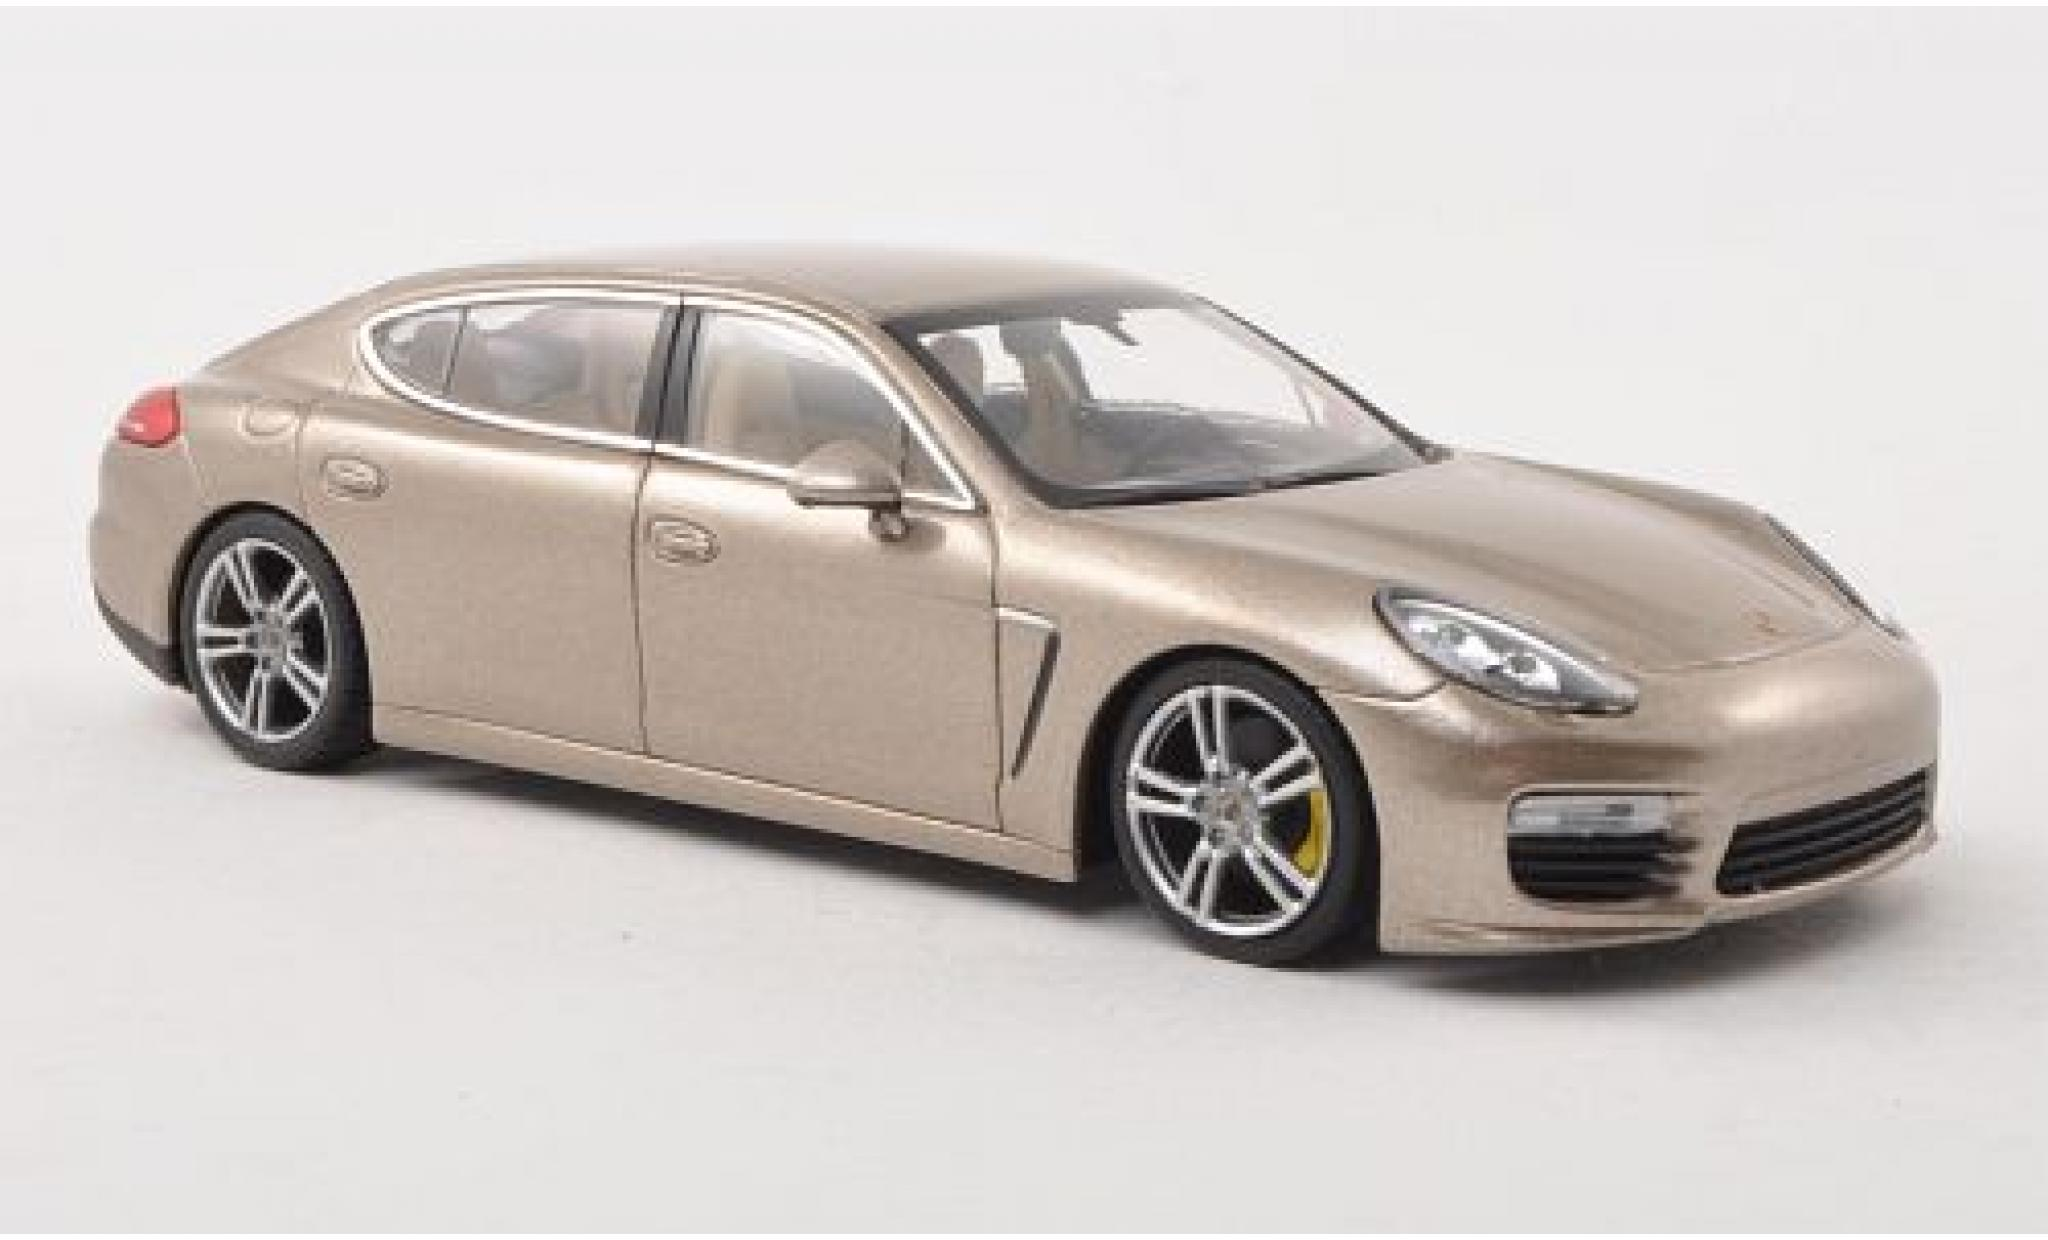 Porsche Panamera Turbo S 1/43 Minichamps Executive metallise beige 2016